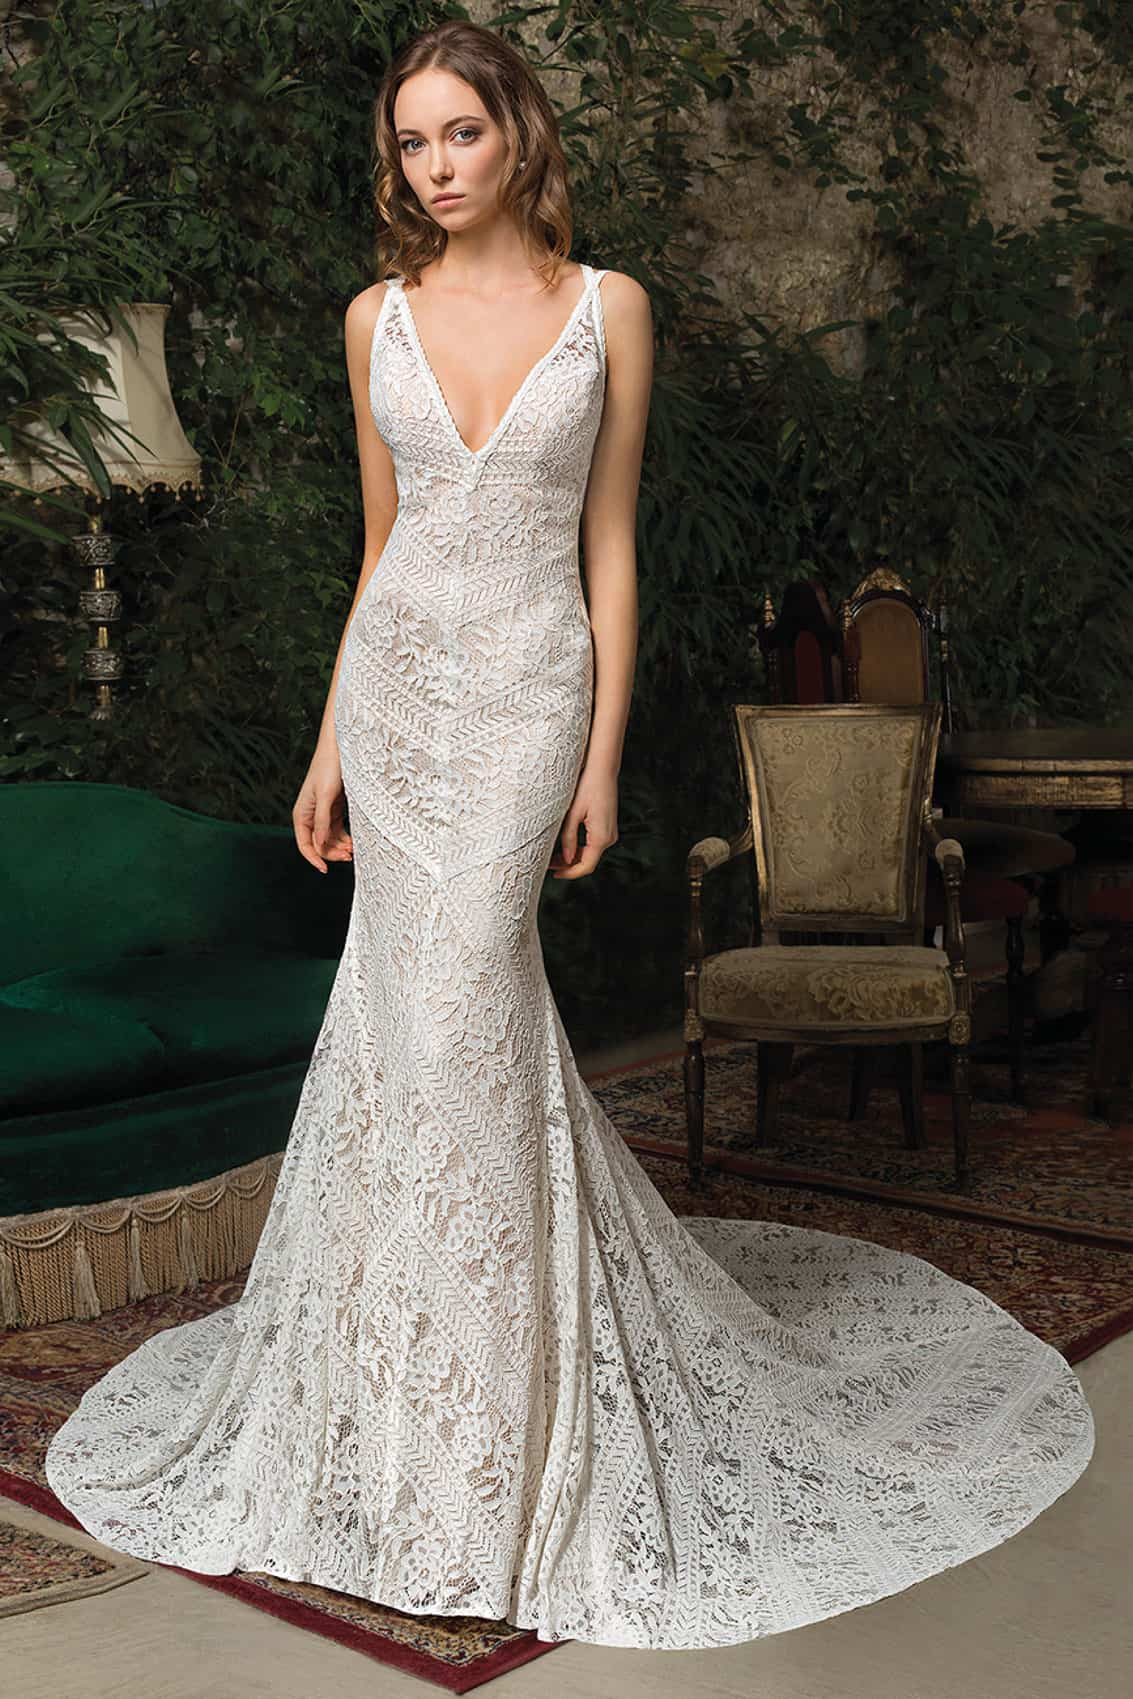 Cosmobella 7967 | Vintage Brautkleid | Hochzeitskleid Meerjungfrau | Brautmode Köln Anna Moda